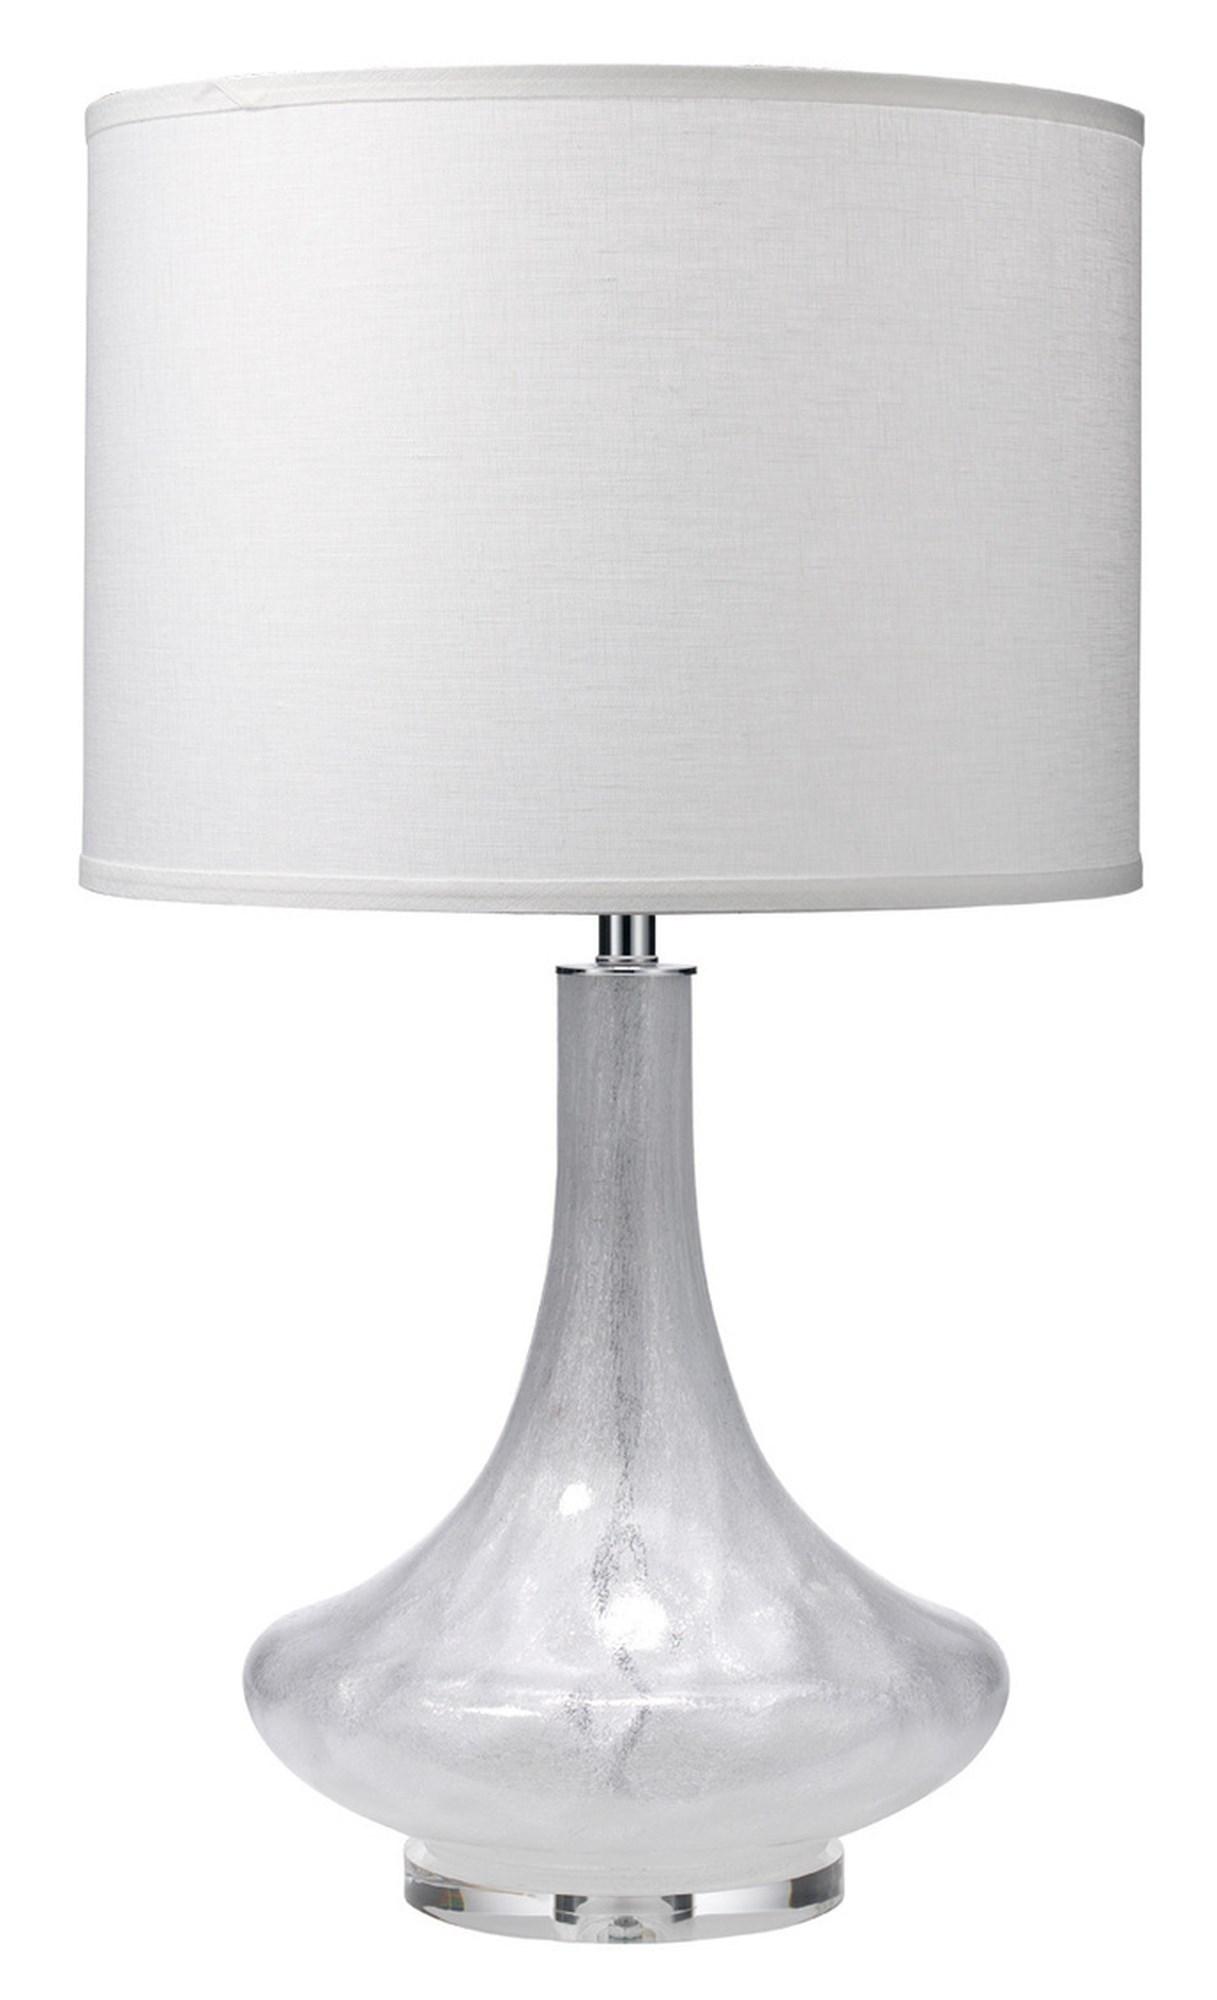 Antique Latour art glass lamp